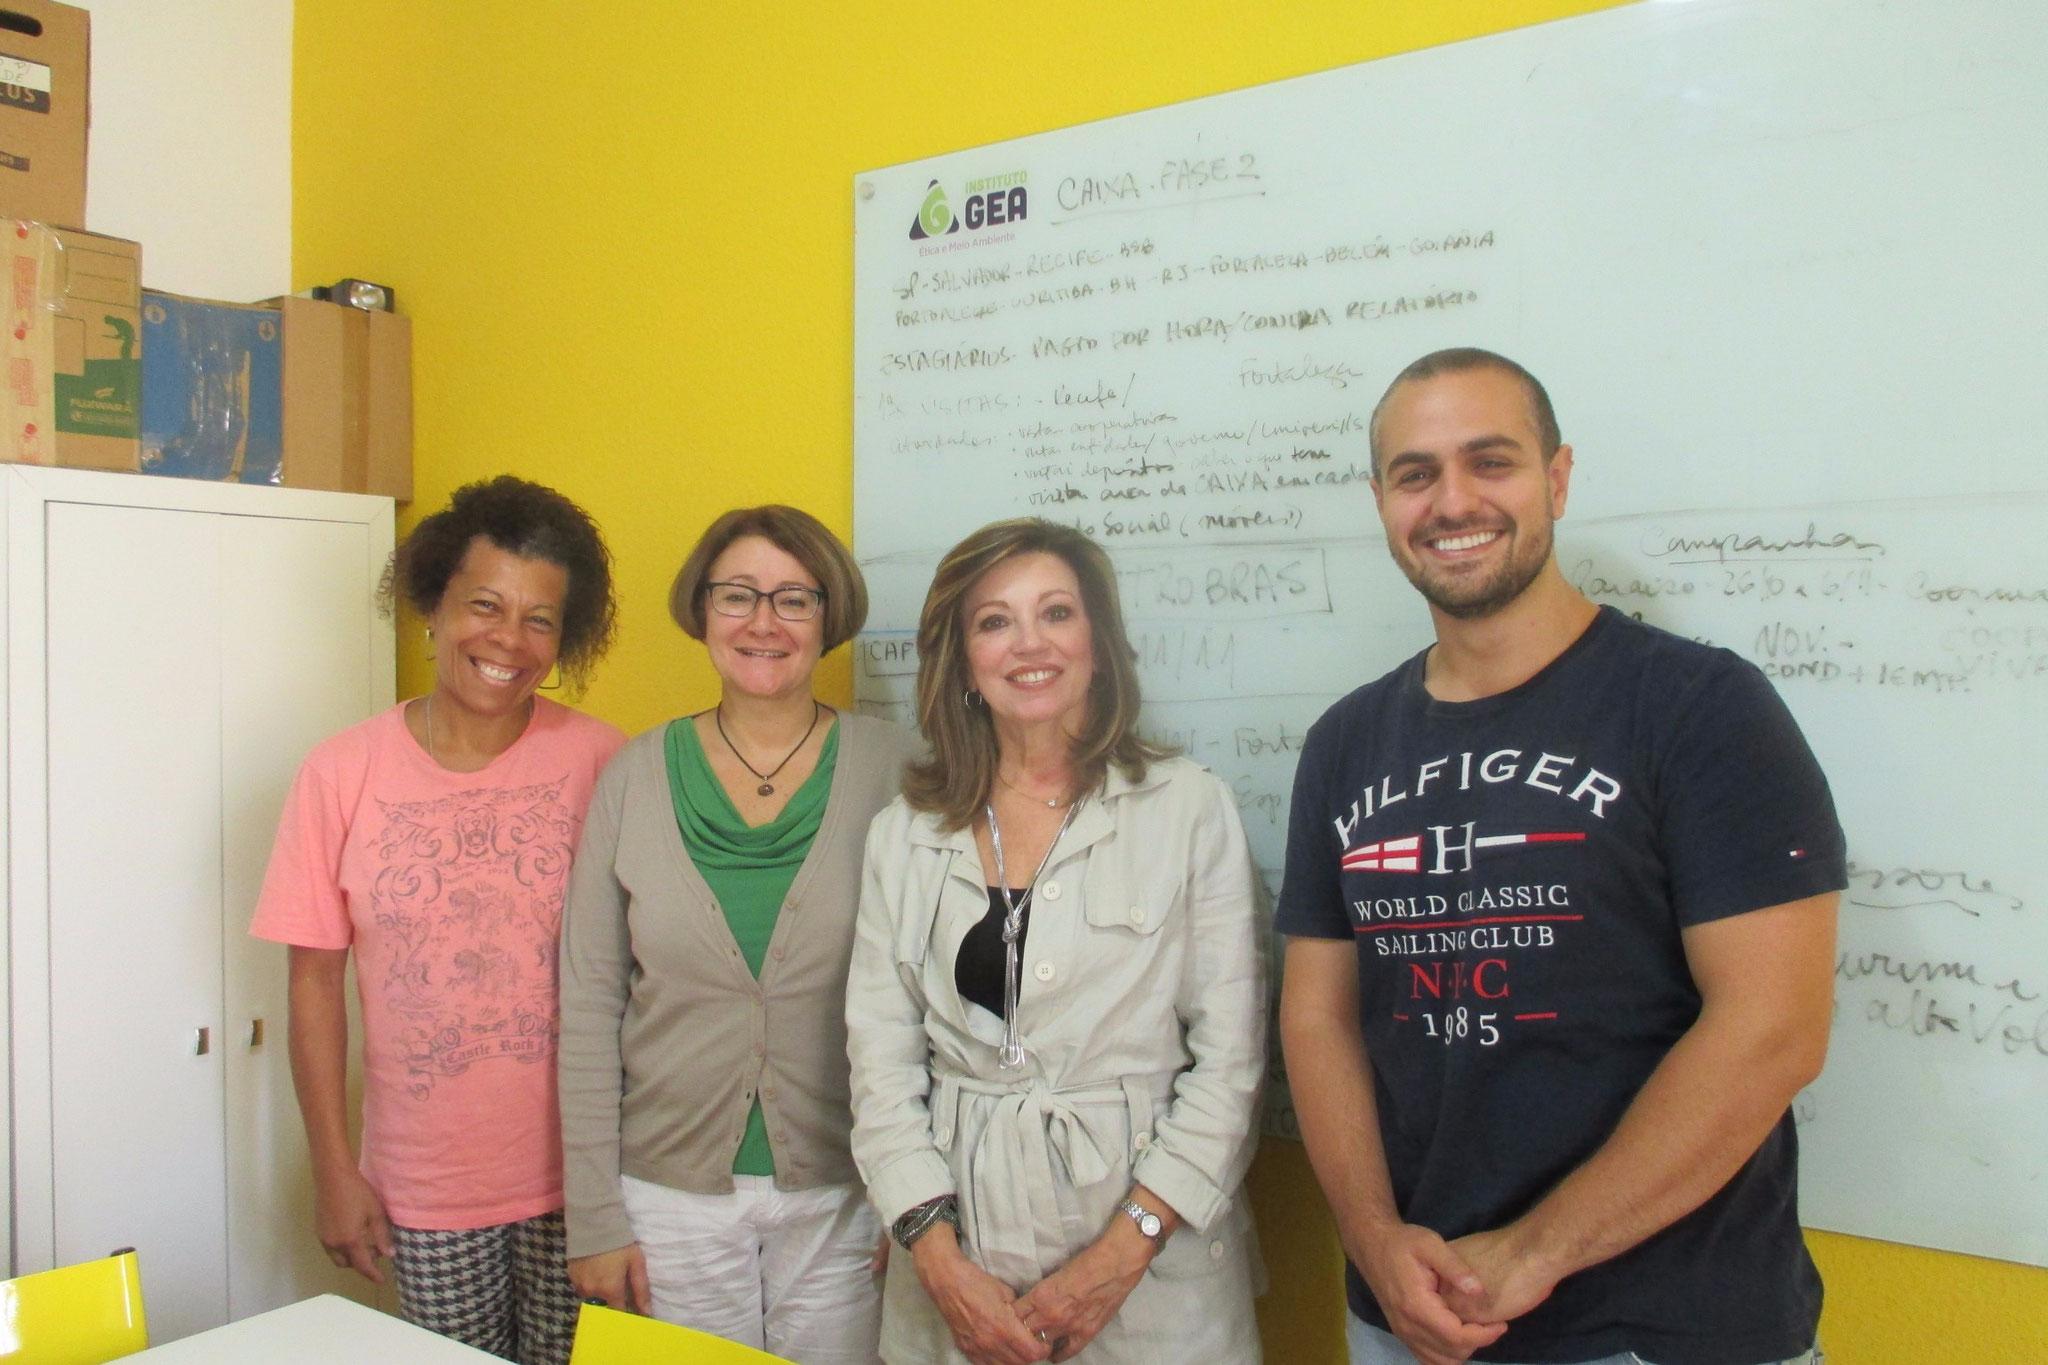 Visiting Instituto GEA - Ética e Meio Ambiente in 2015, Sao Paulo, Brazil.